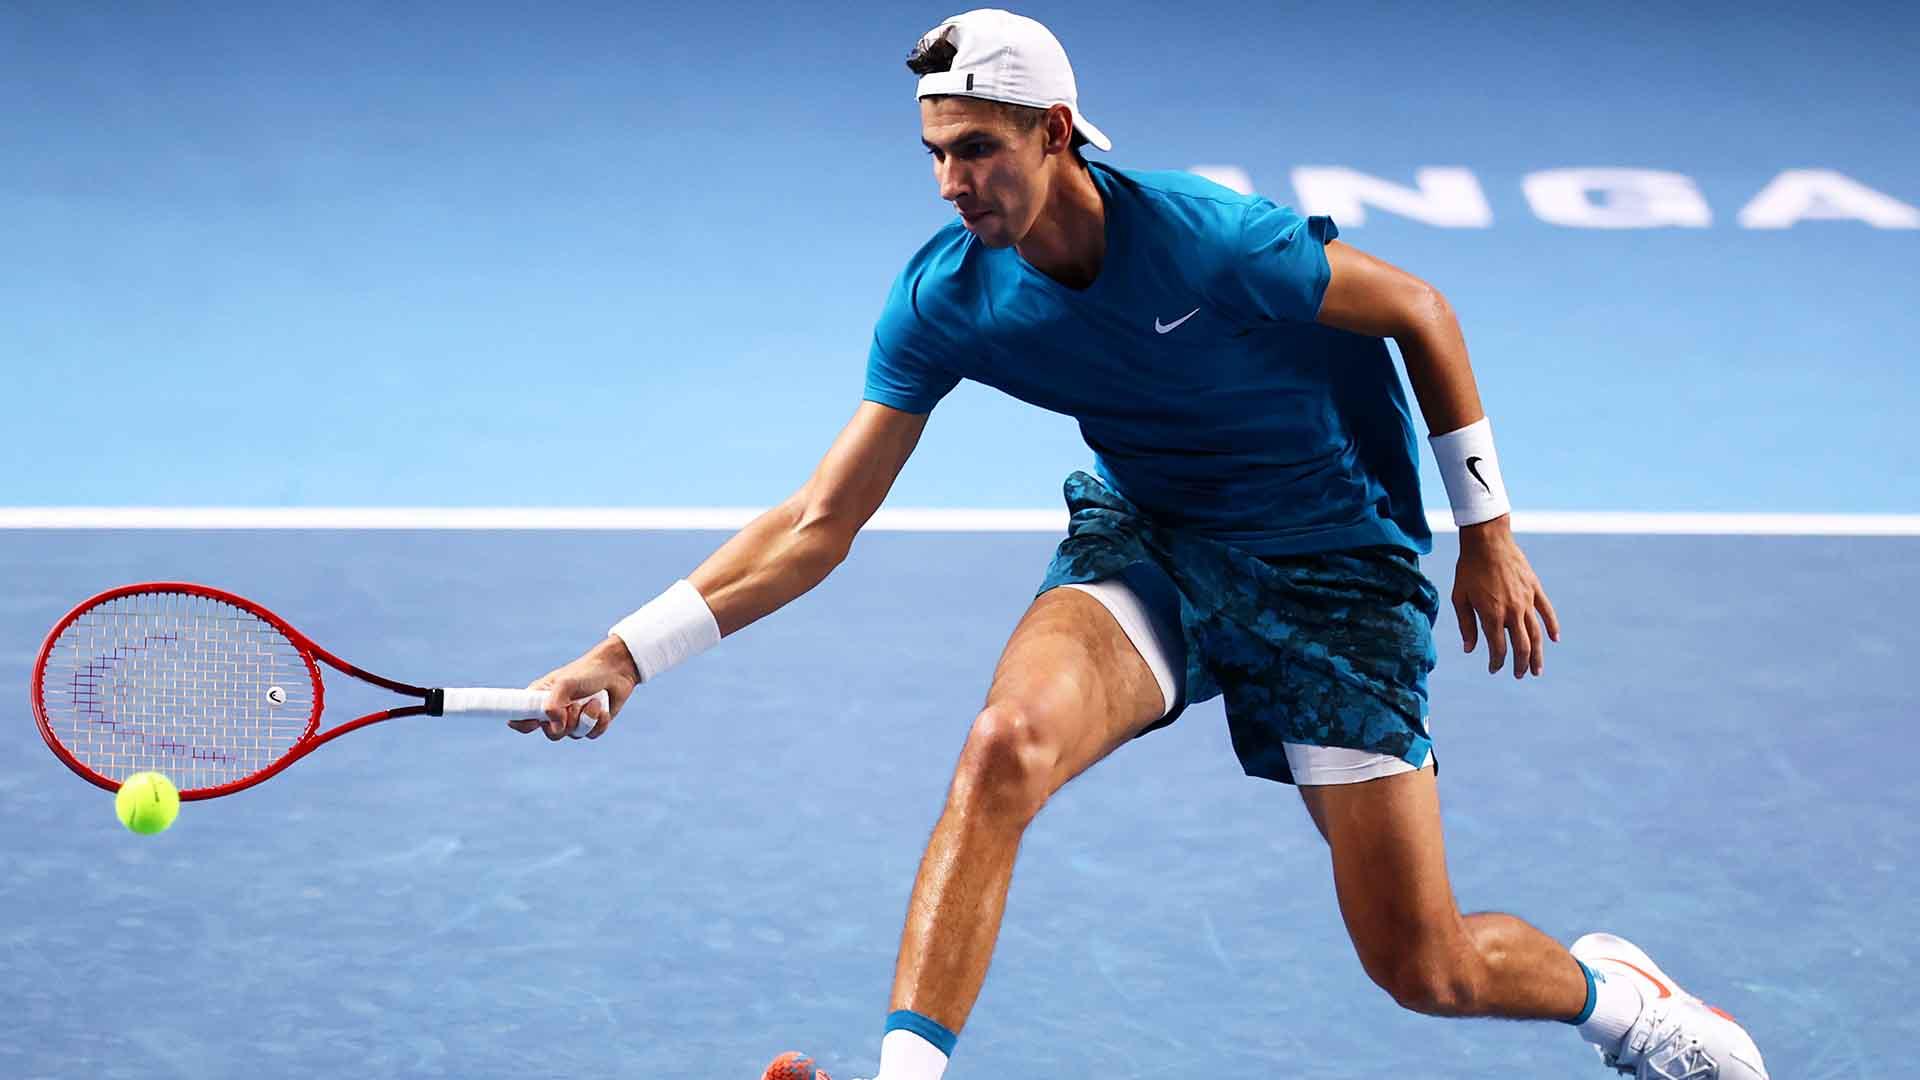 Alexei Popyrin will face Alexander Bublik for the Singapore Tennis Open title on Sunday.